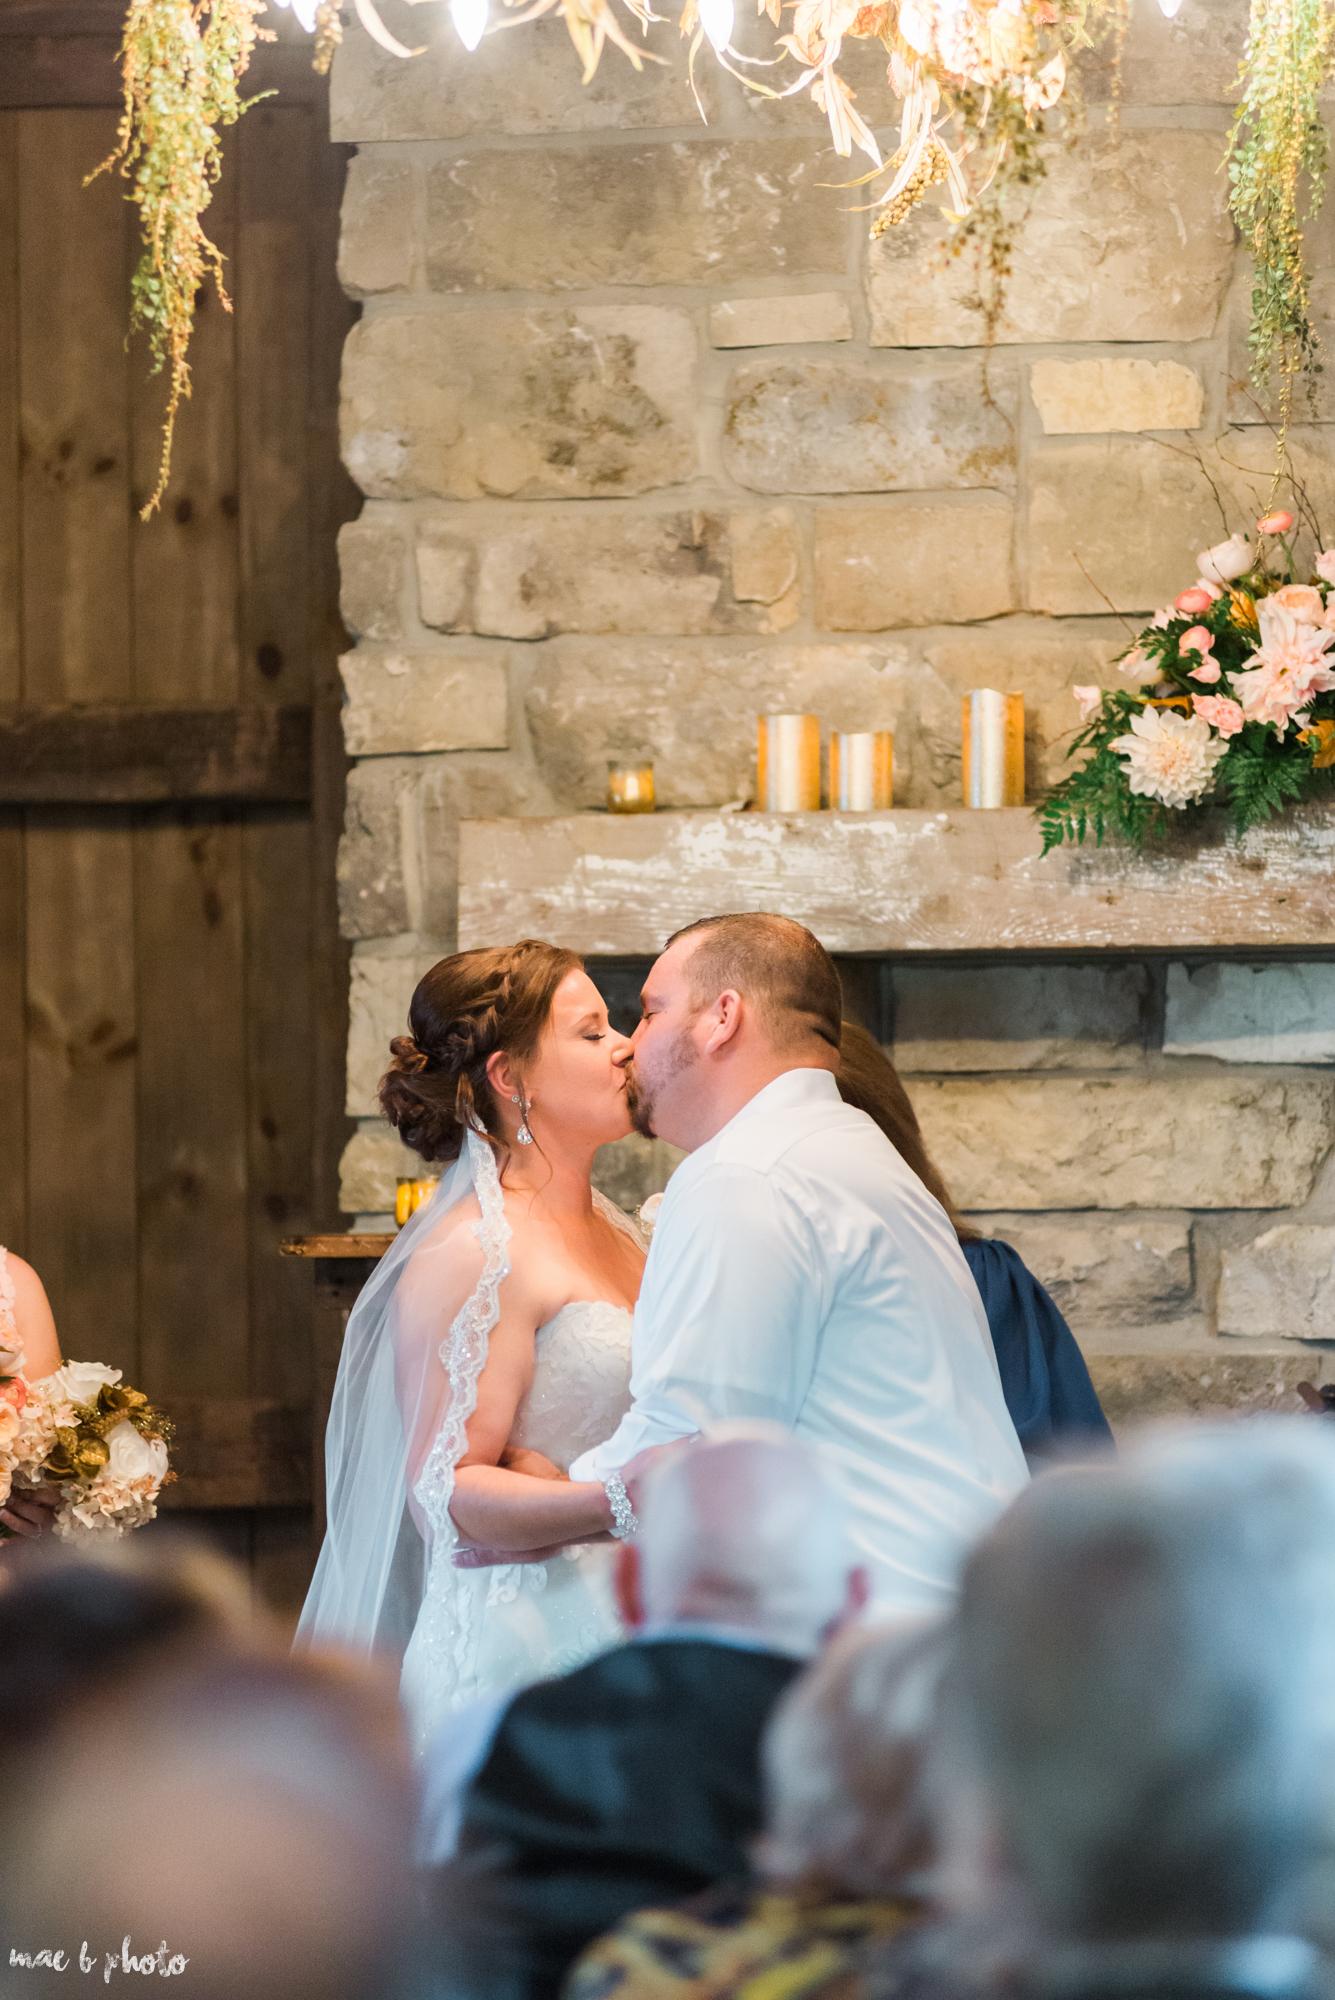 Sarah & Dustin's Rustic Chic Barn Wedding at Hartford Hill Winery in Hartford, Ohio by Mae B Photo-48.jpg